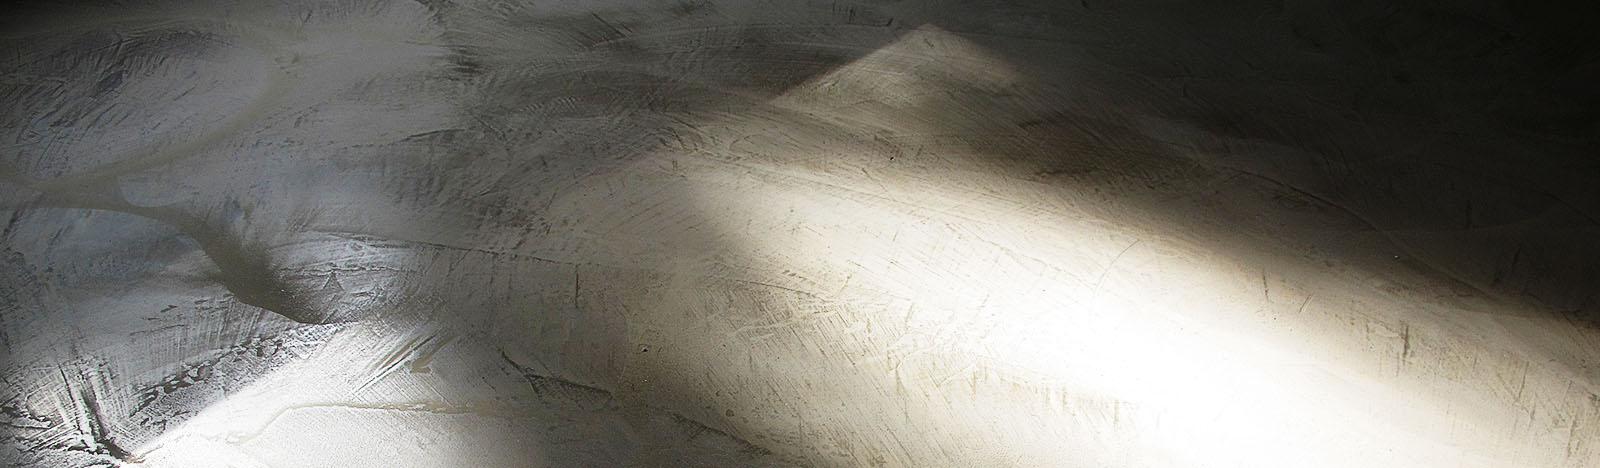 Betonboden Reinigen beton ciré designboden bosus steinböden